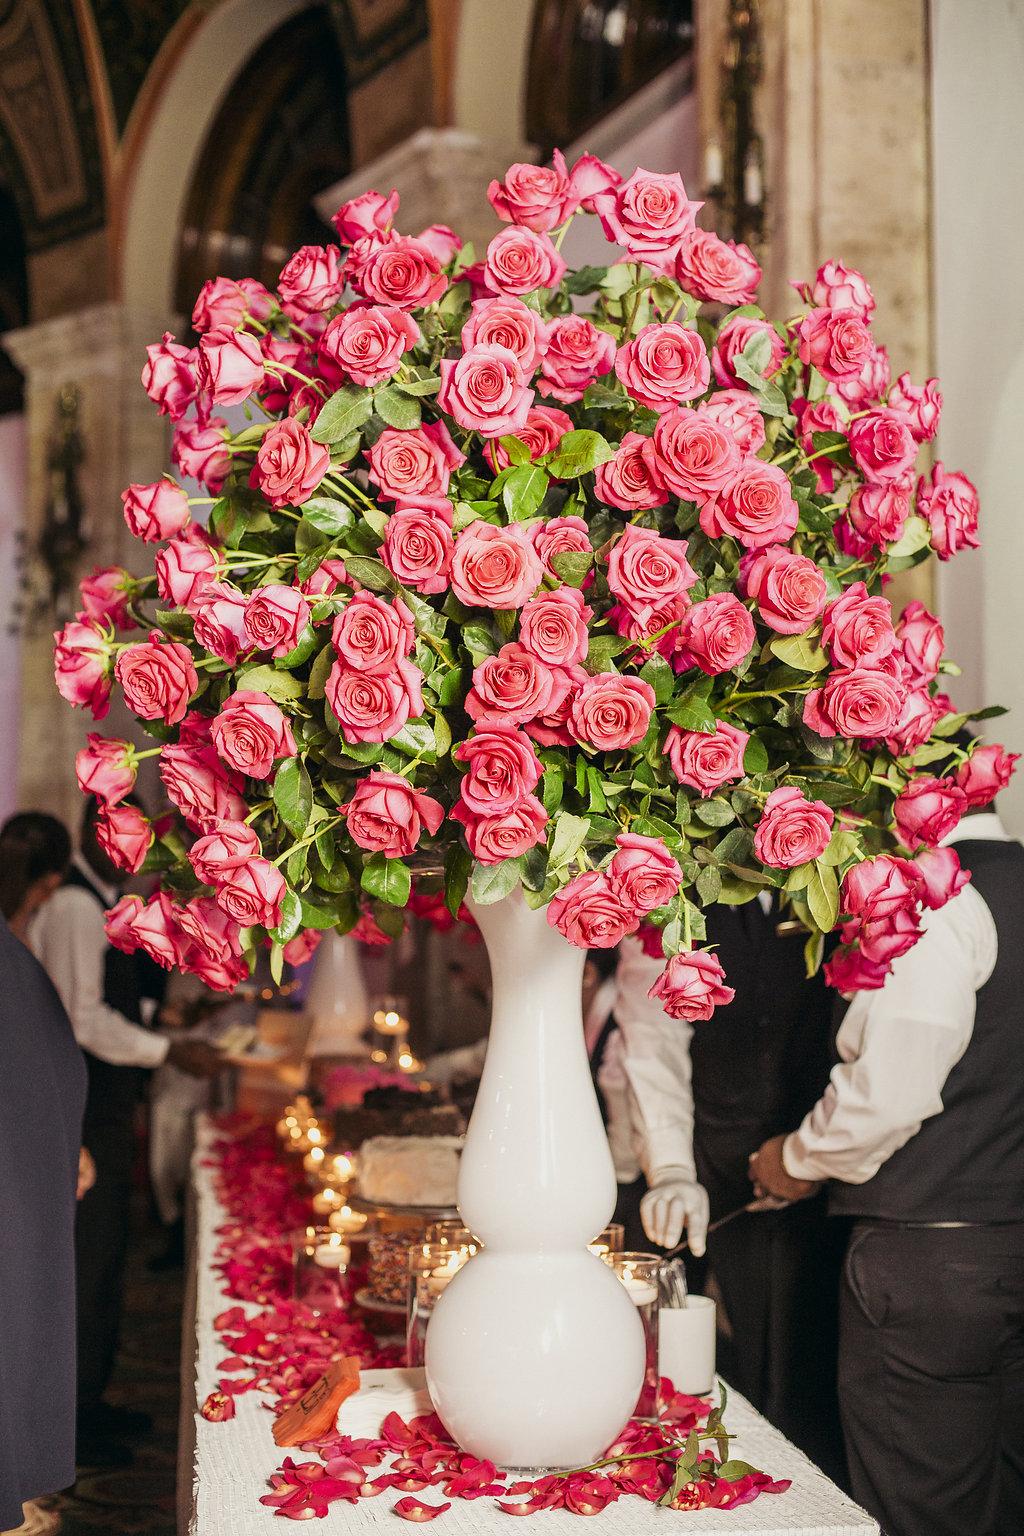 flower arrangement in a vase with many long stemmed red roses